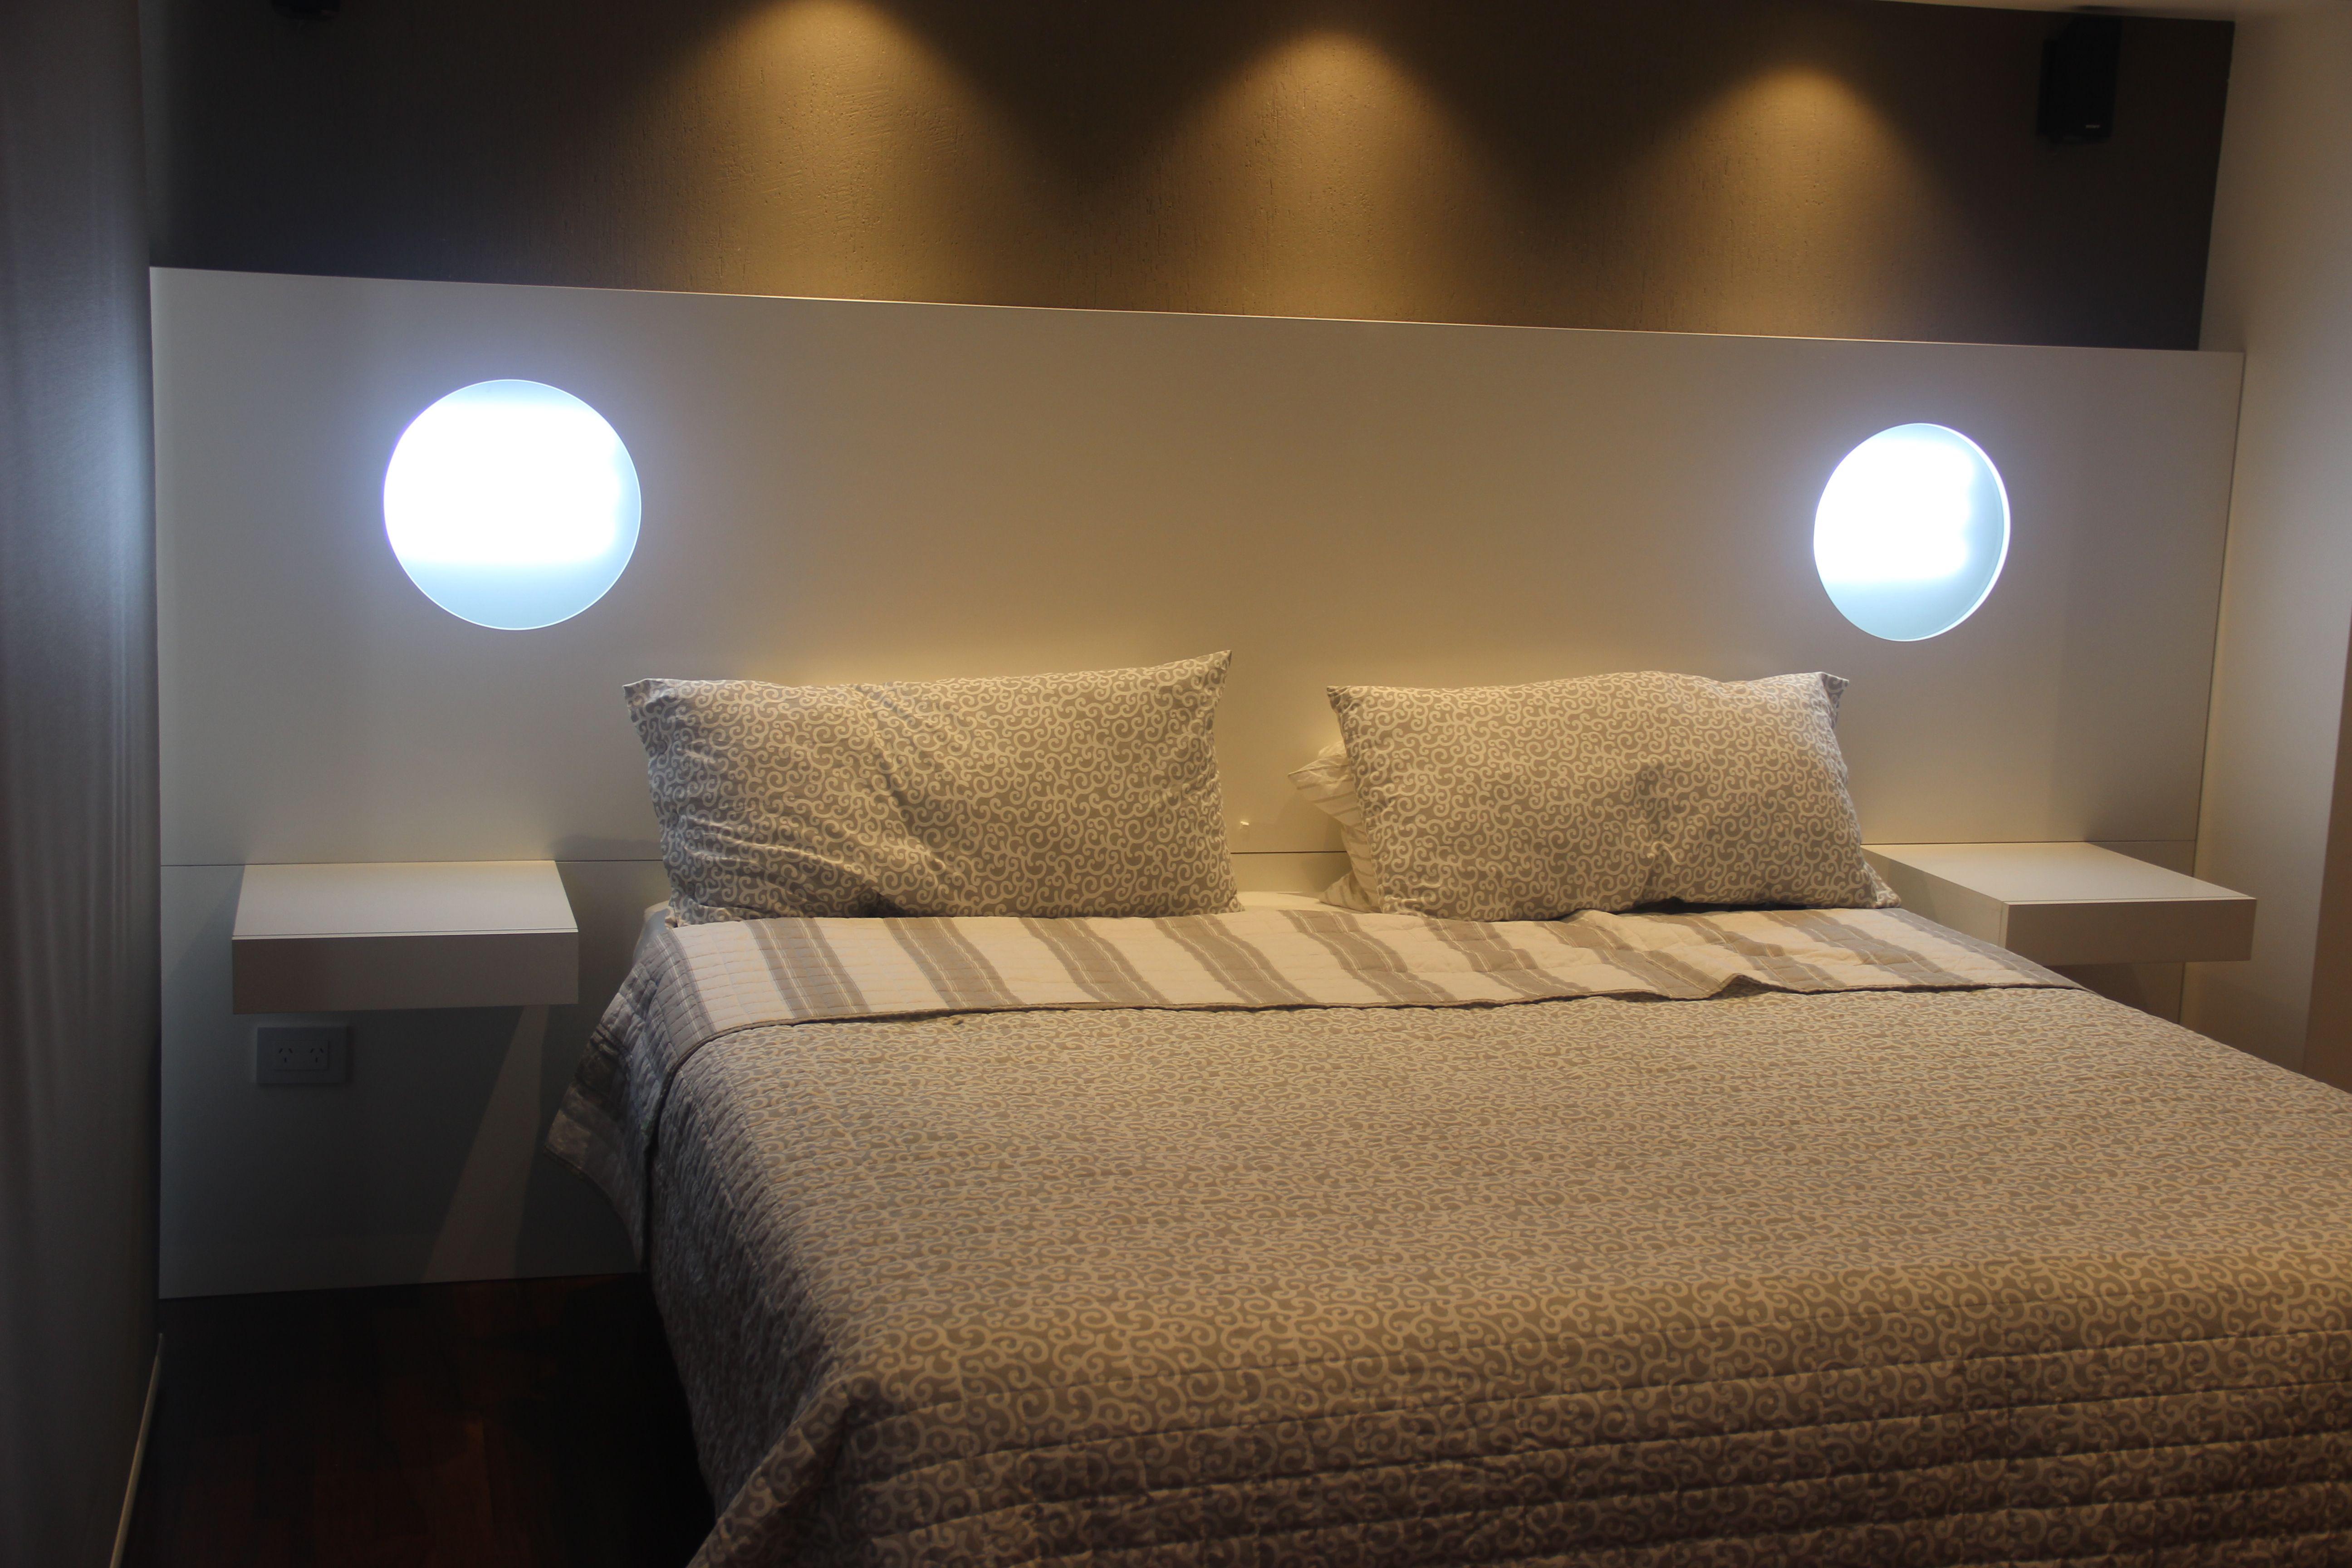 Respaldo de cama con luces incorporadas   respaldo   Pinterest ...